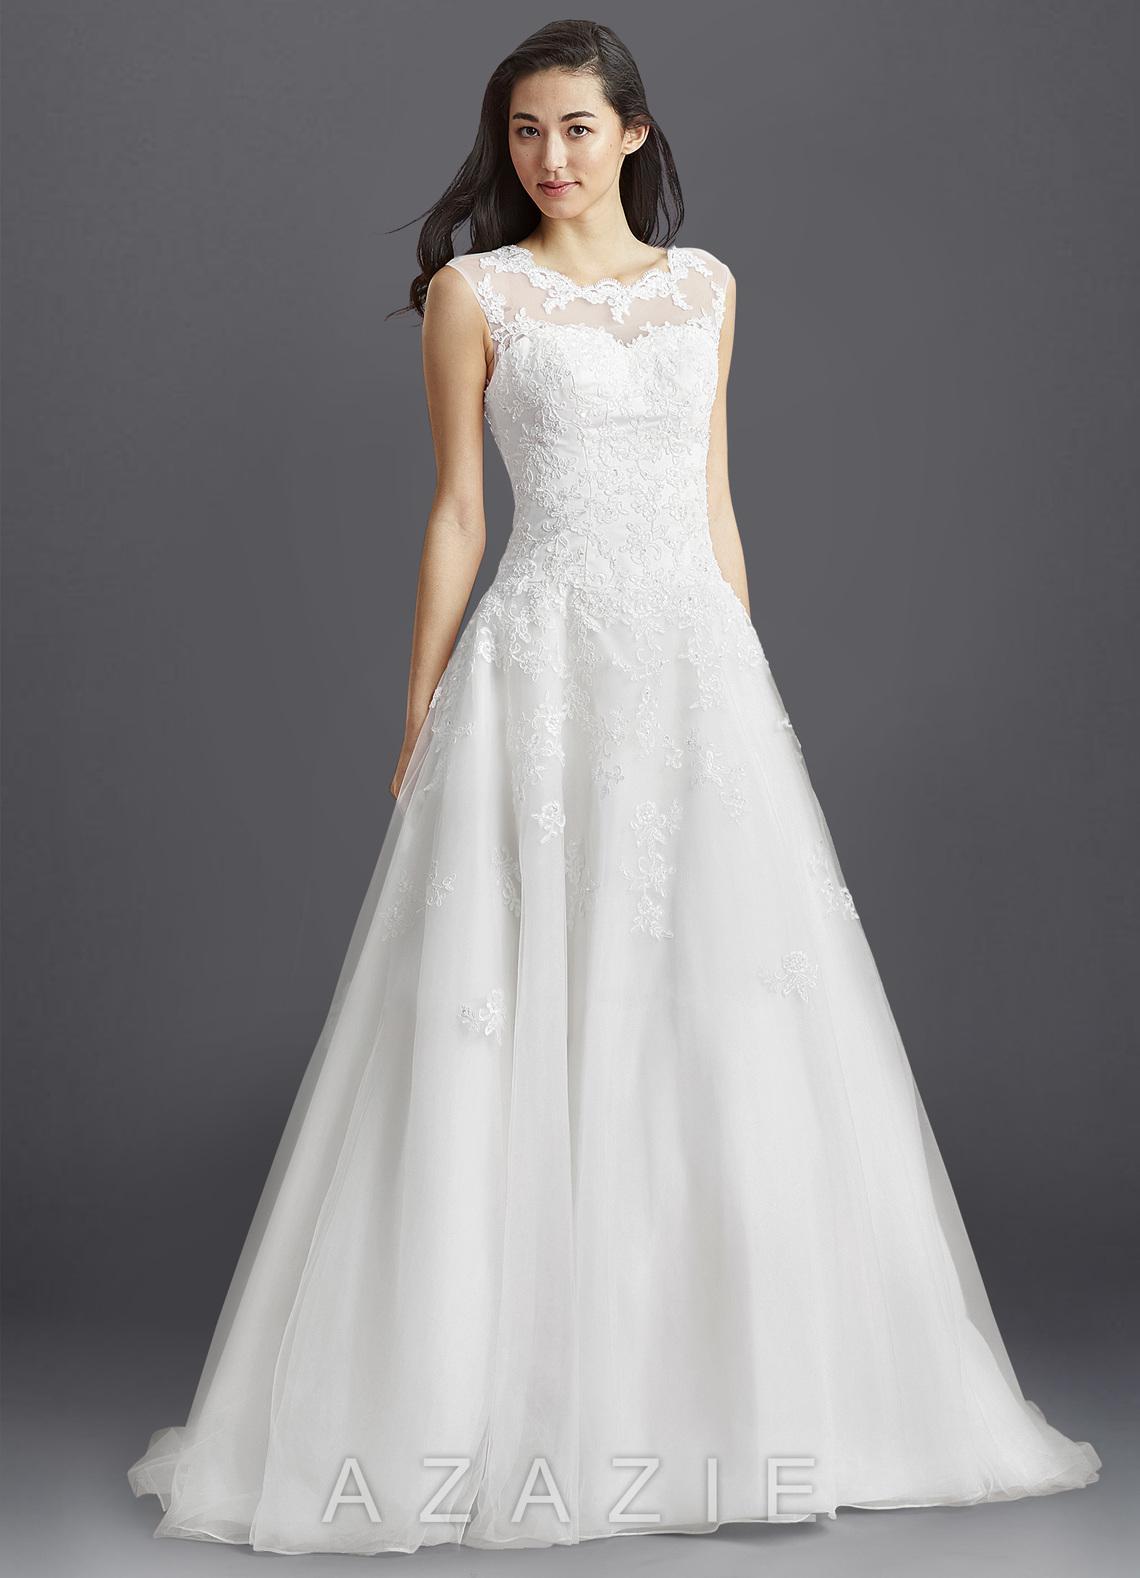 Azazie Fantasia BG Wedding Dresses b8646204c